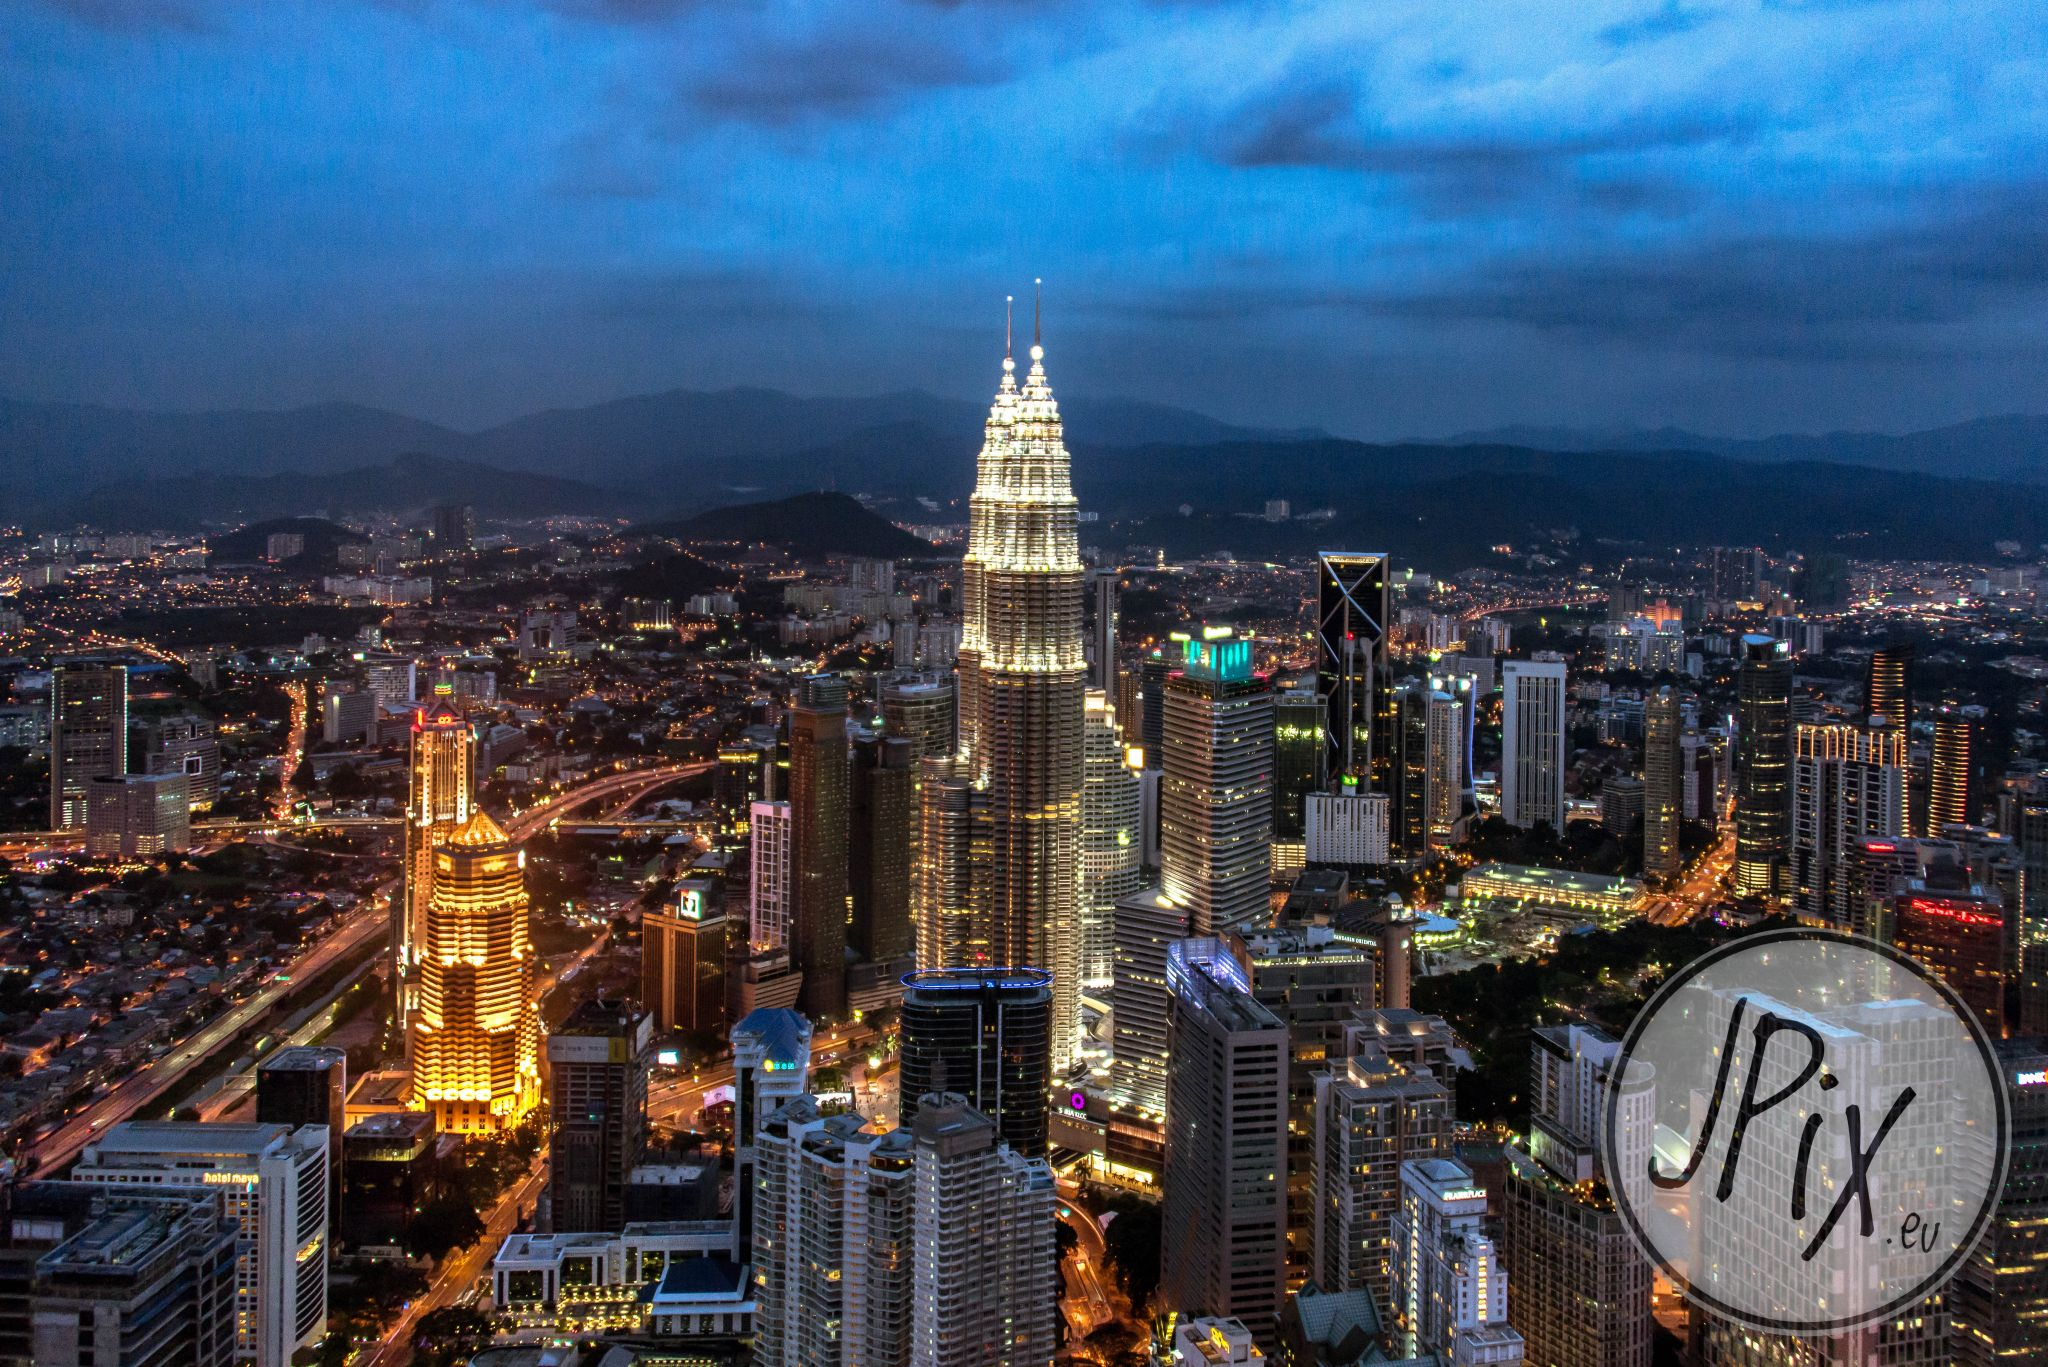 Petronas Twin Towers from Menara Kuala Lumpur, Malaysia